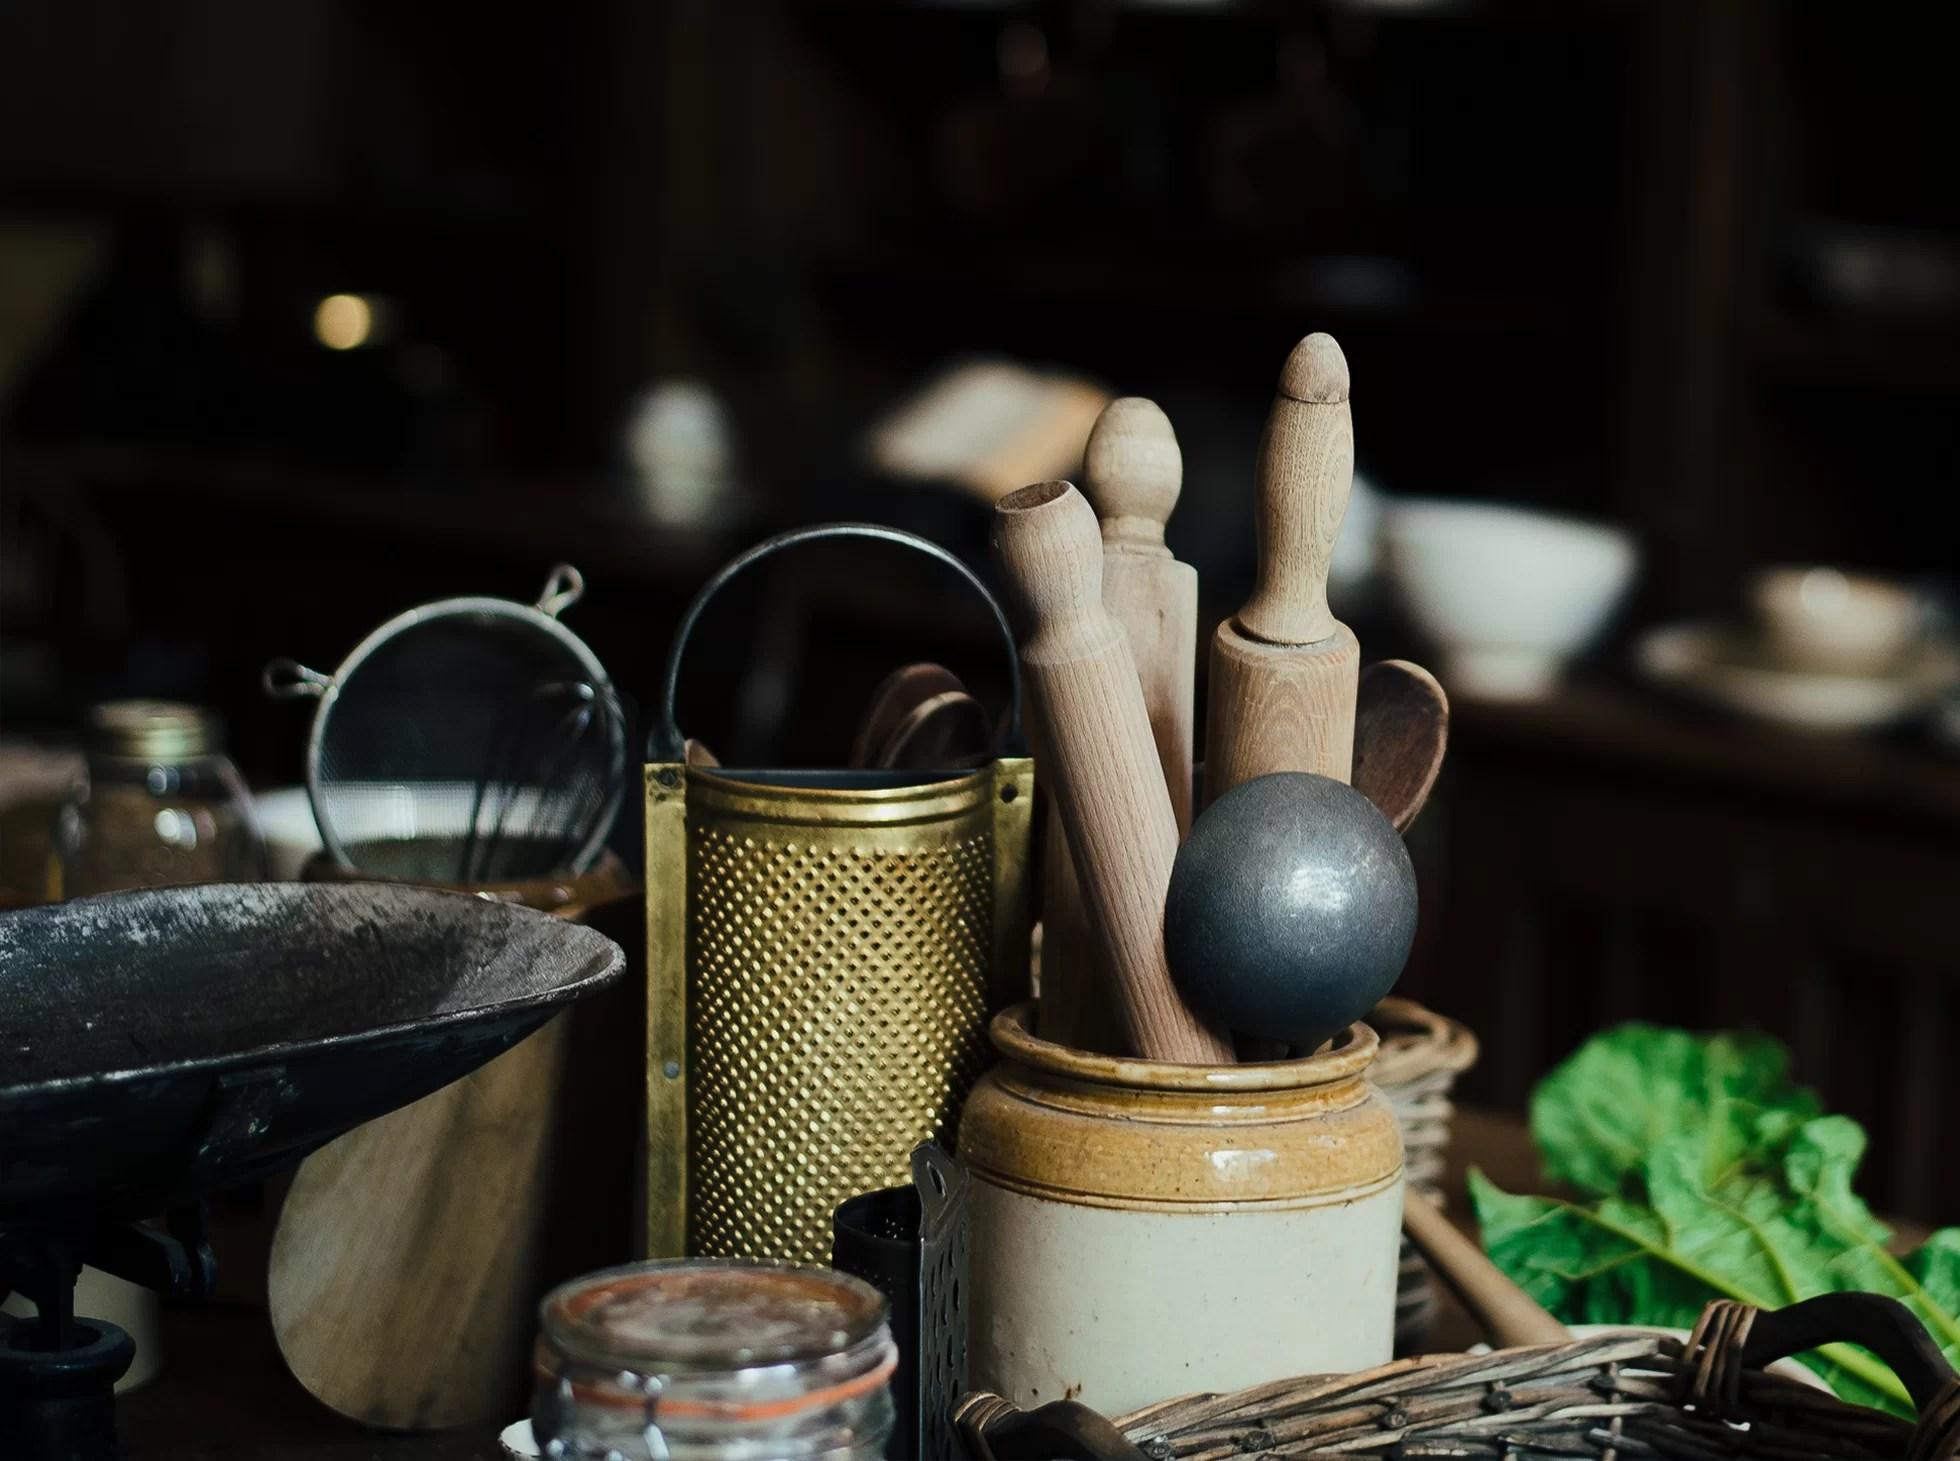 Historie kulinarne w podcastach